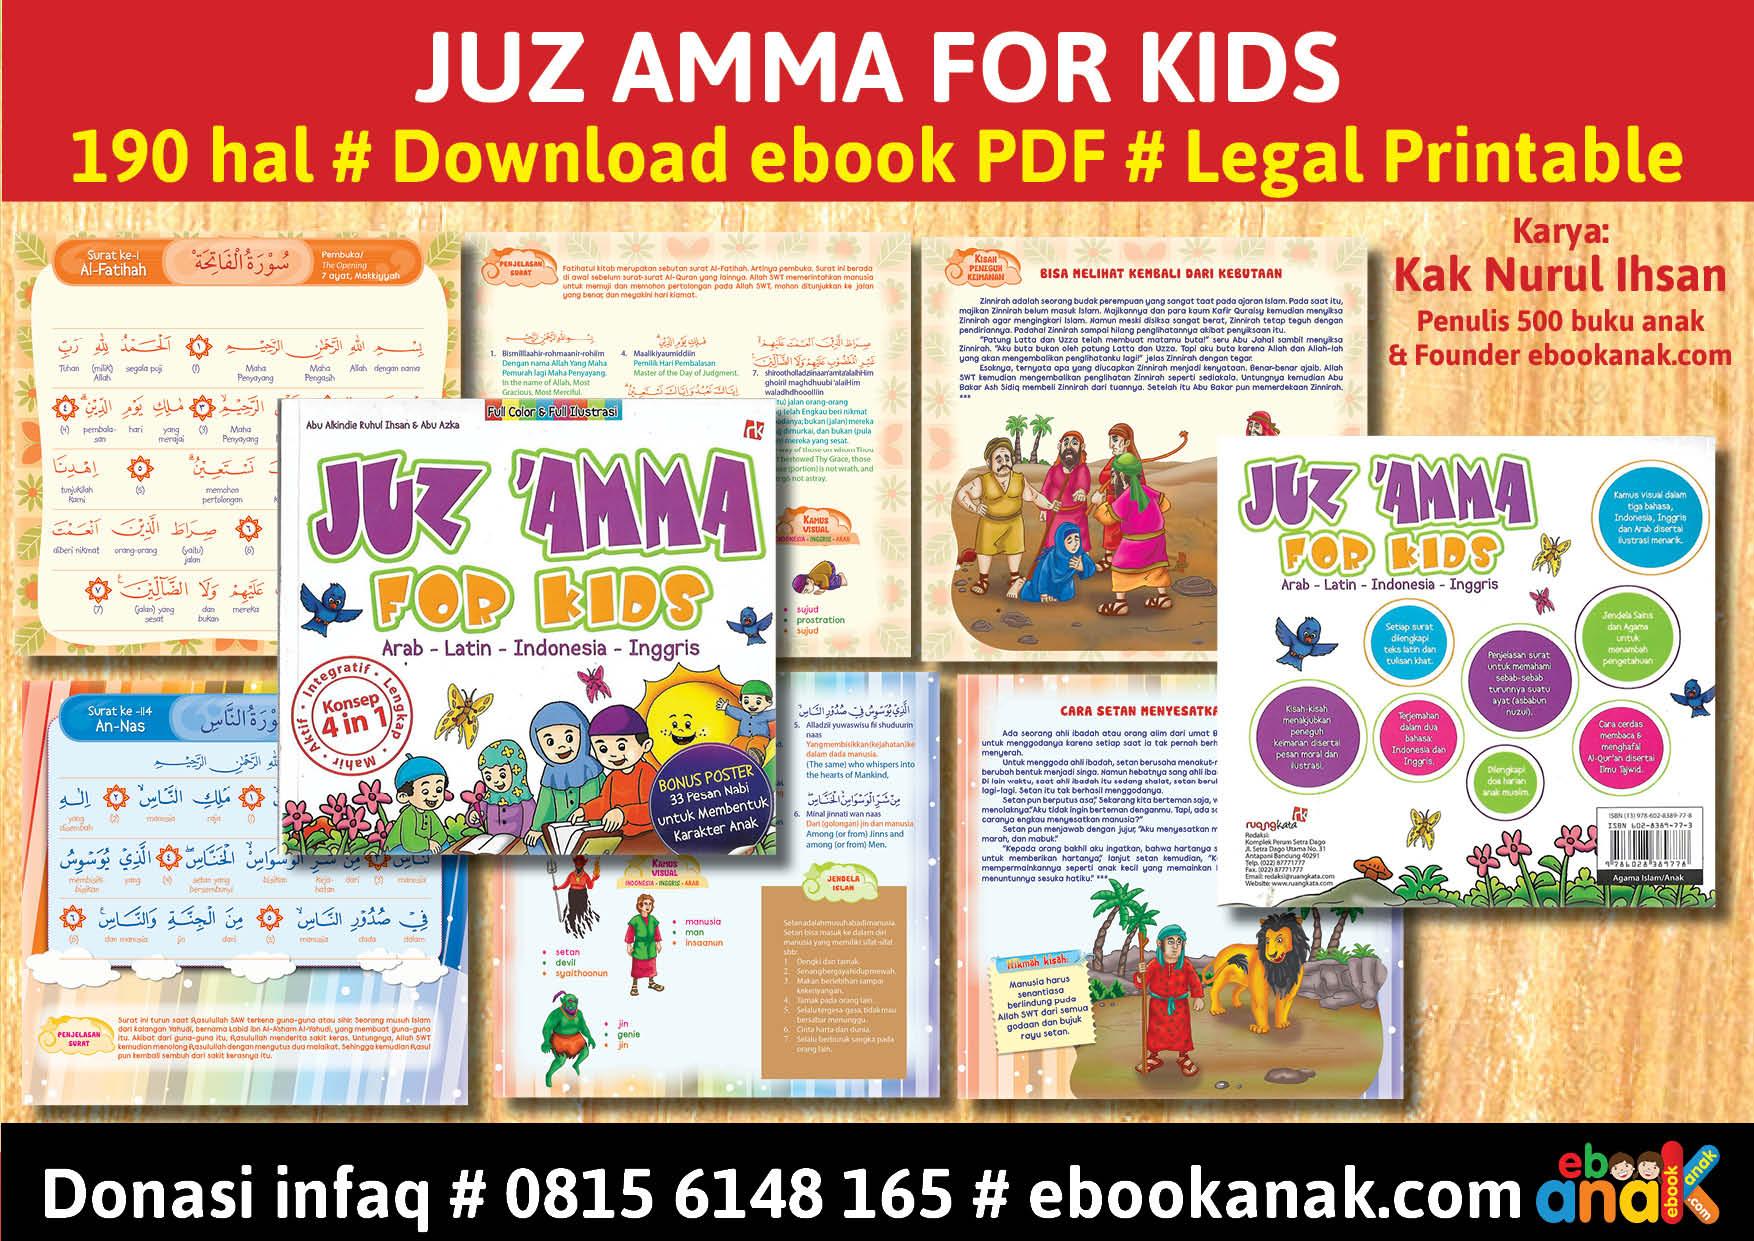 baner ebook juz amma for kids